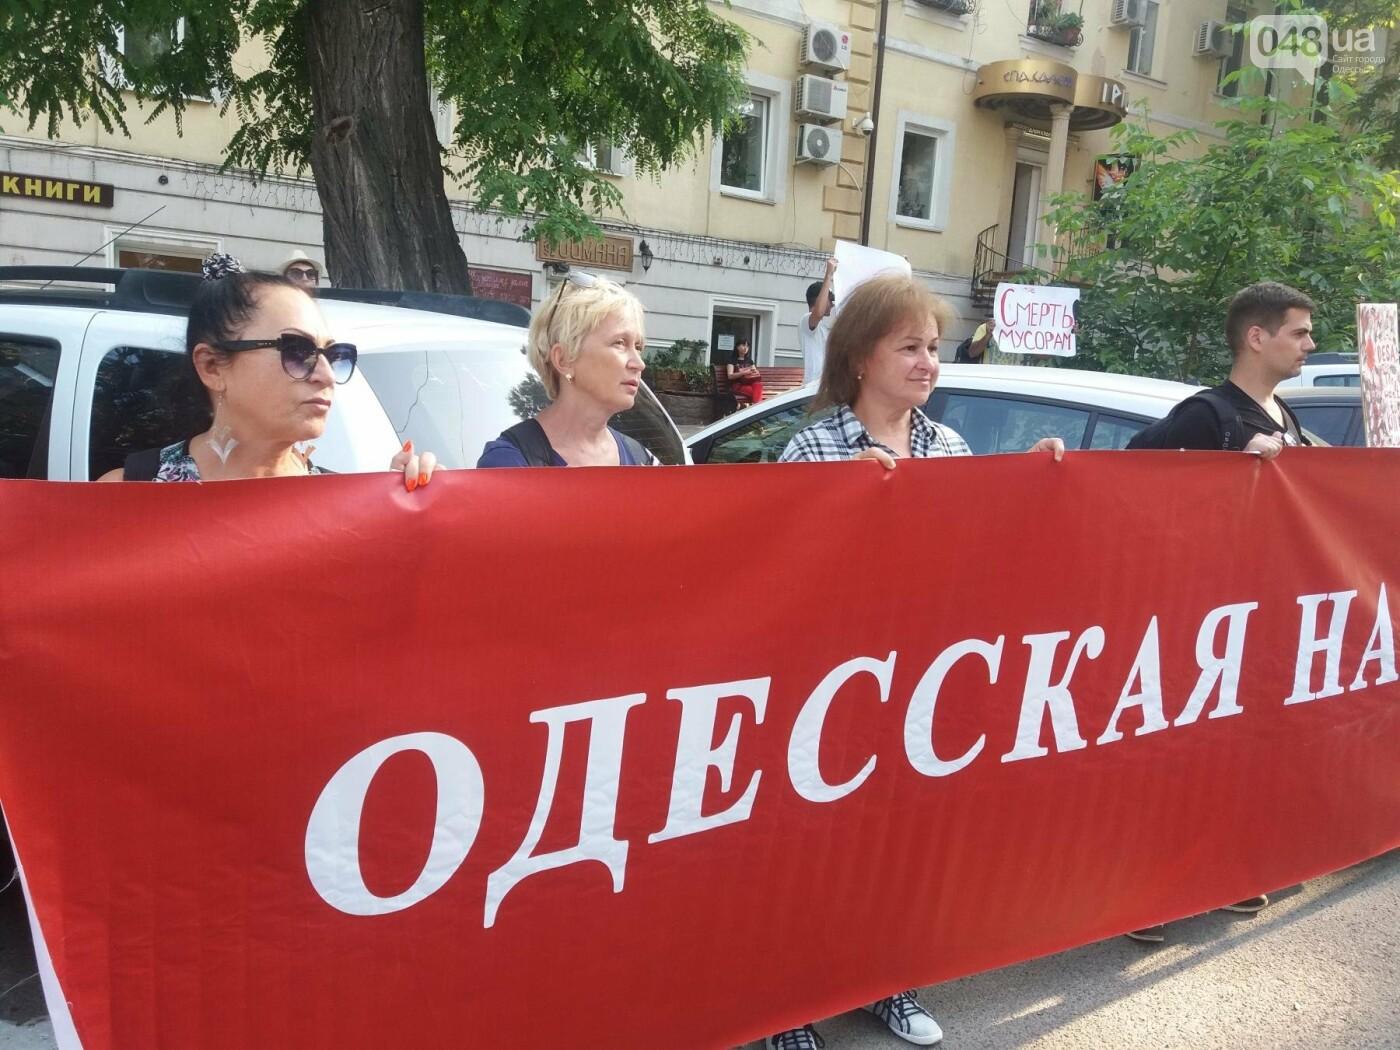 В Одессе протестовали против нападений на активистов и журналистов, - ФОТО, ВИДЕО, фото-5